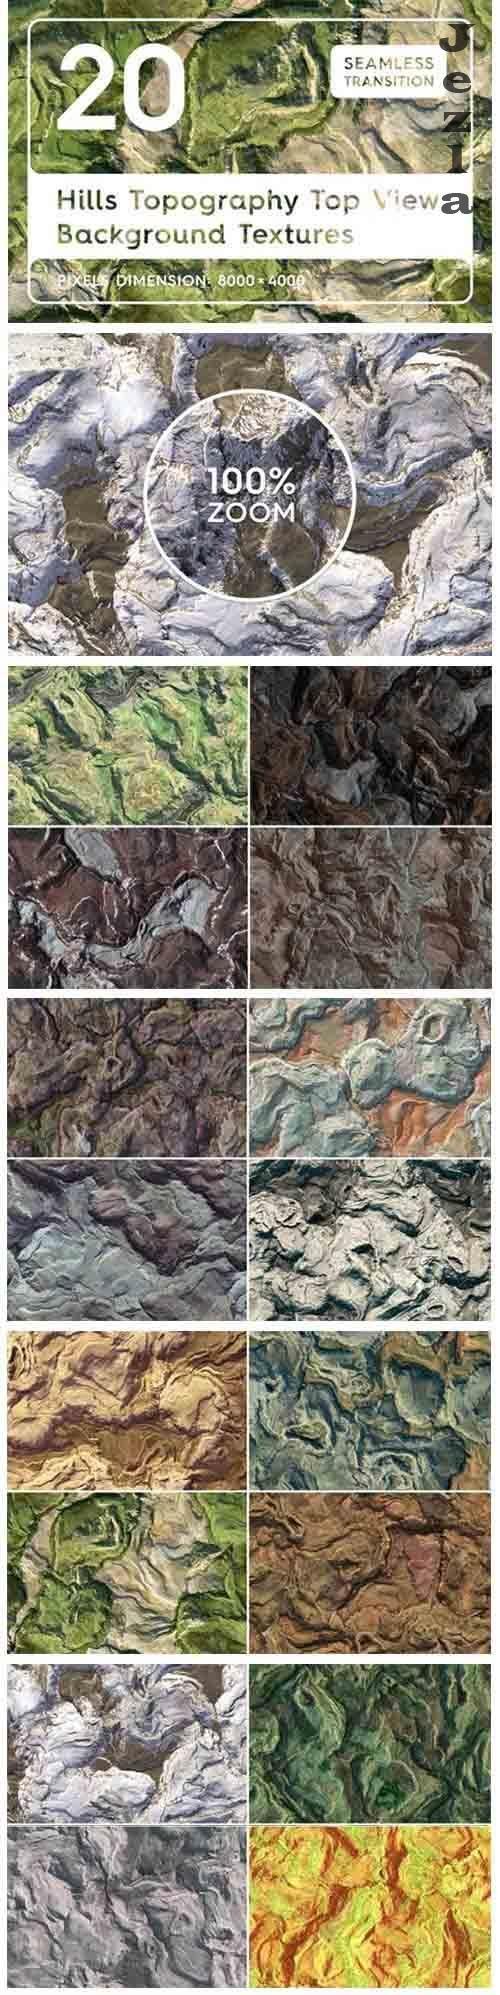 20 Hills Topography Atop Textures - 5170075